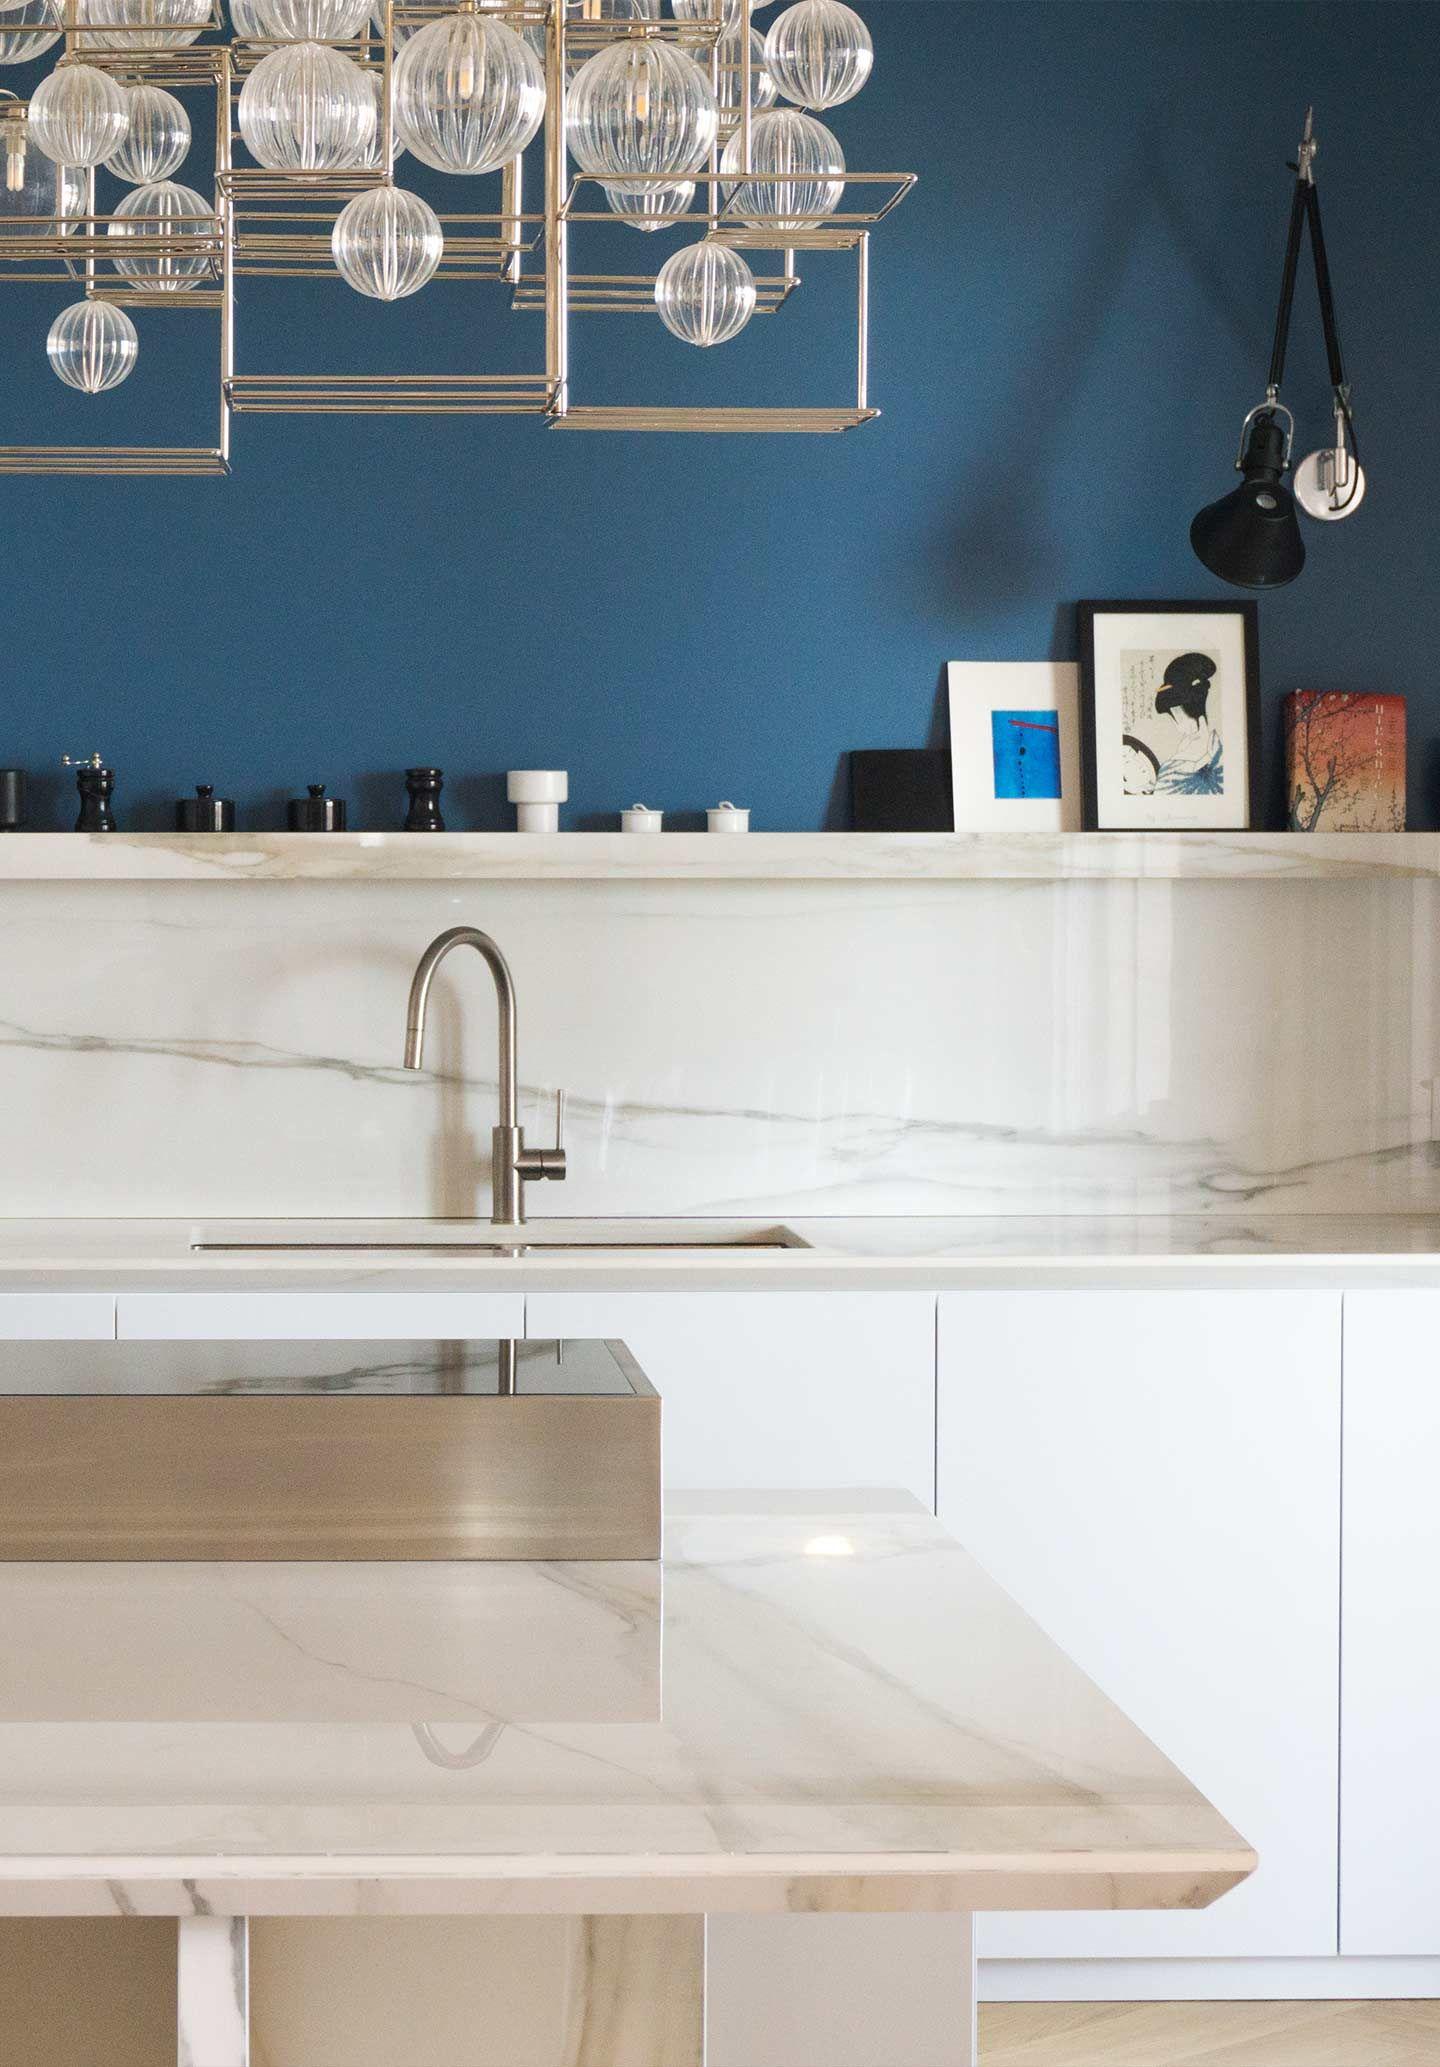 Porcelain Kitchen Countertops Florim Stone Plan De Travail